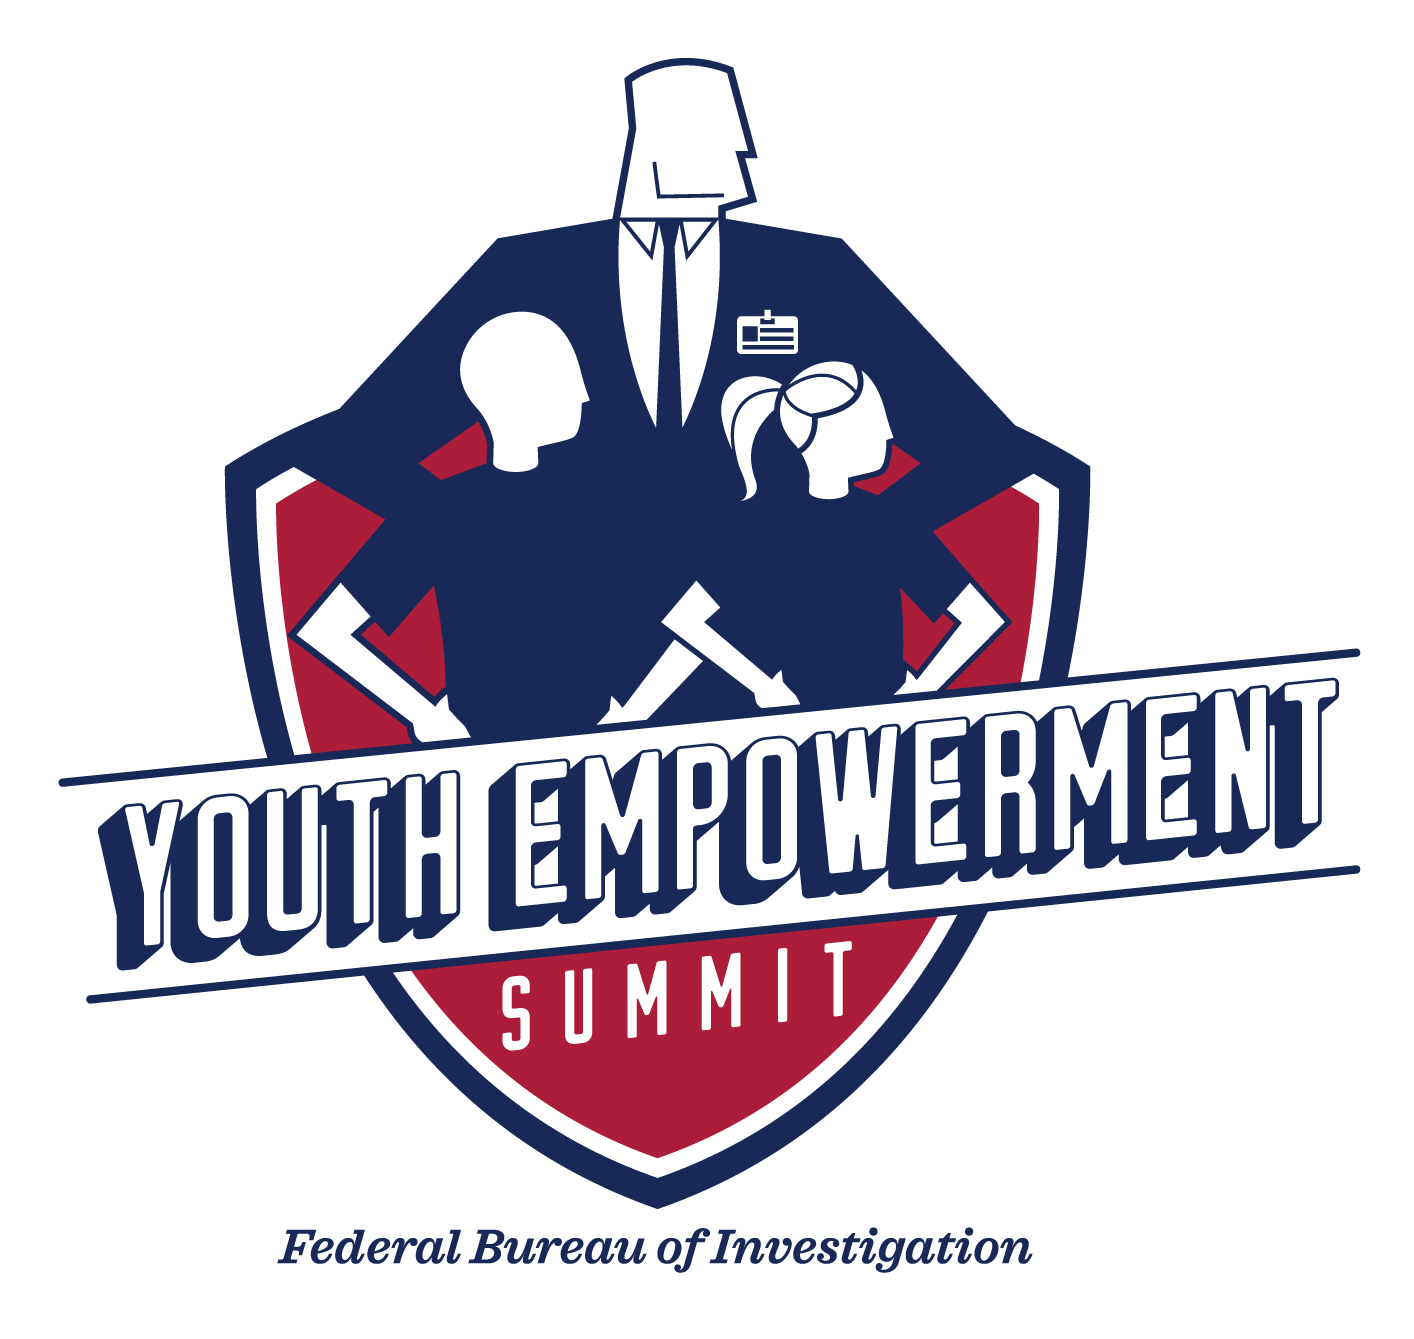 FBI Miami Youth Empowerment Summit 2019 logo